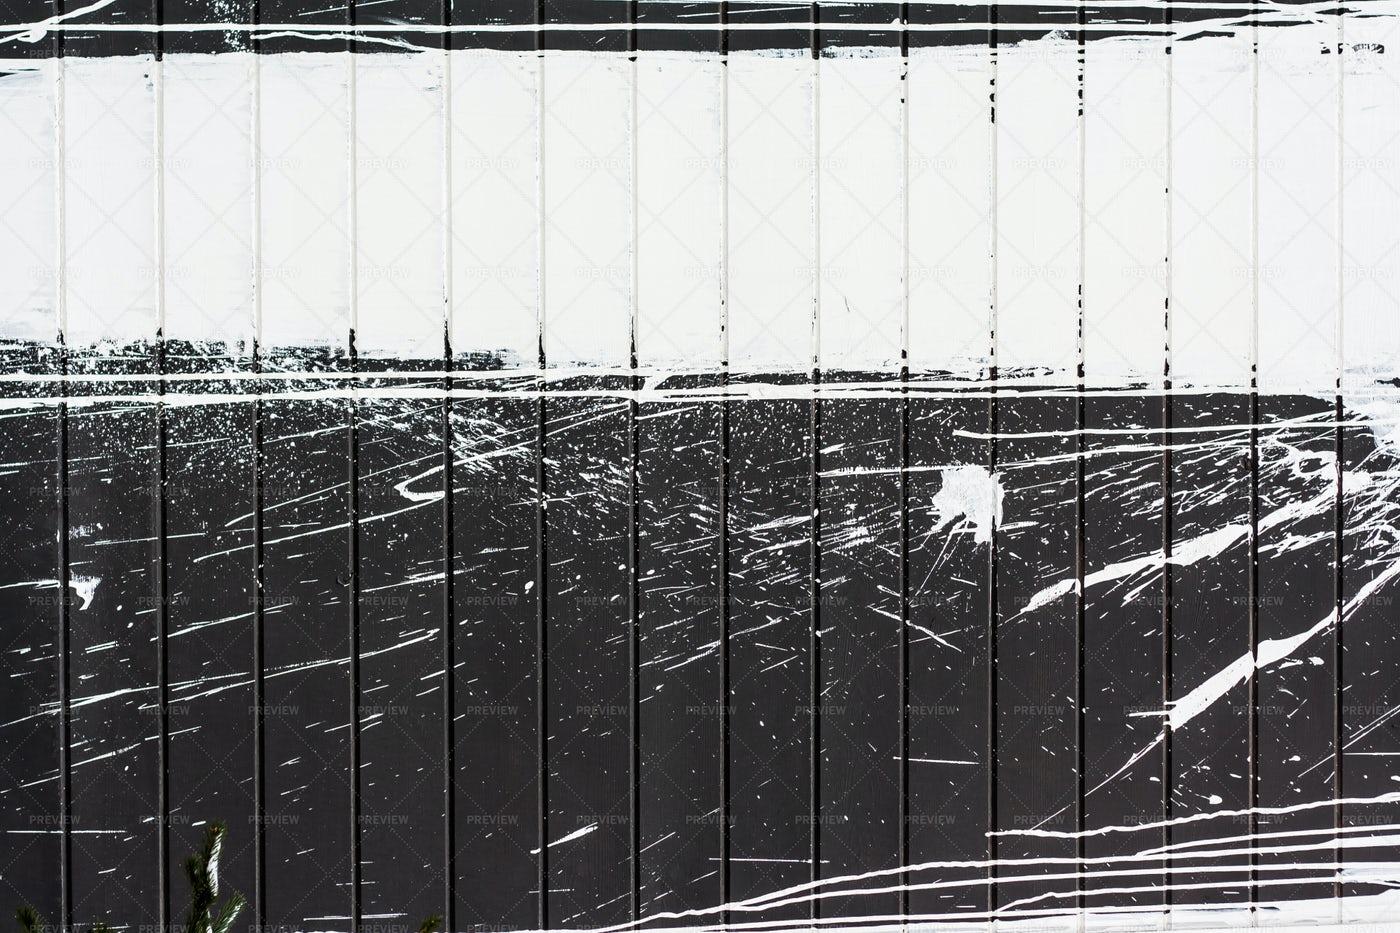 Splashed Paint On Black Wall: Stock Photos